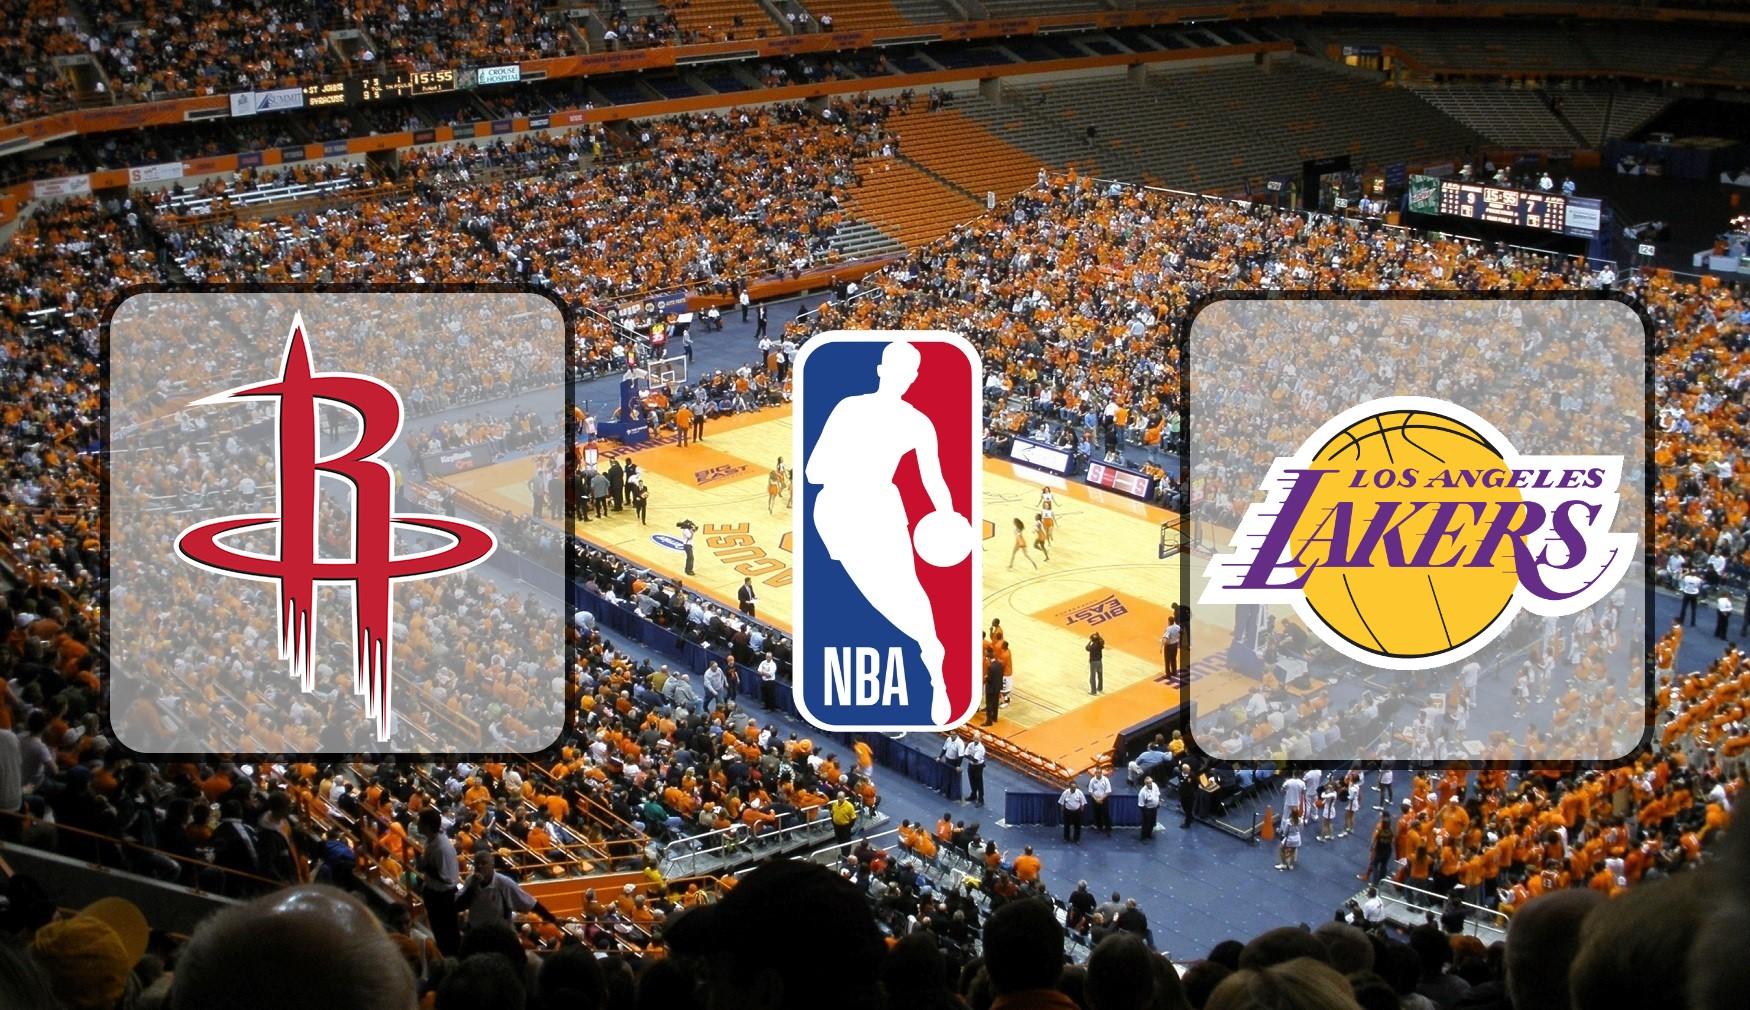 """Хьюстон"" – ""Лос-Анджелес Лейкерс"". Прогноз на матч НБА 14.12.2018"